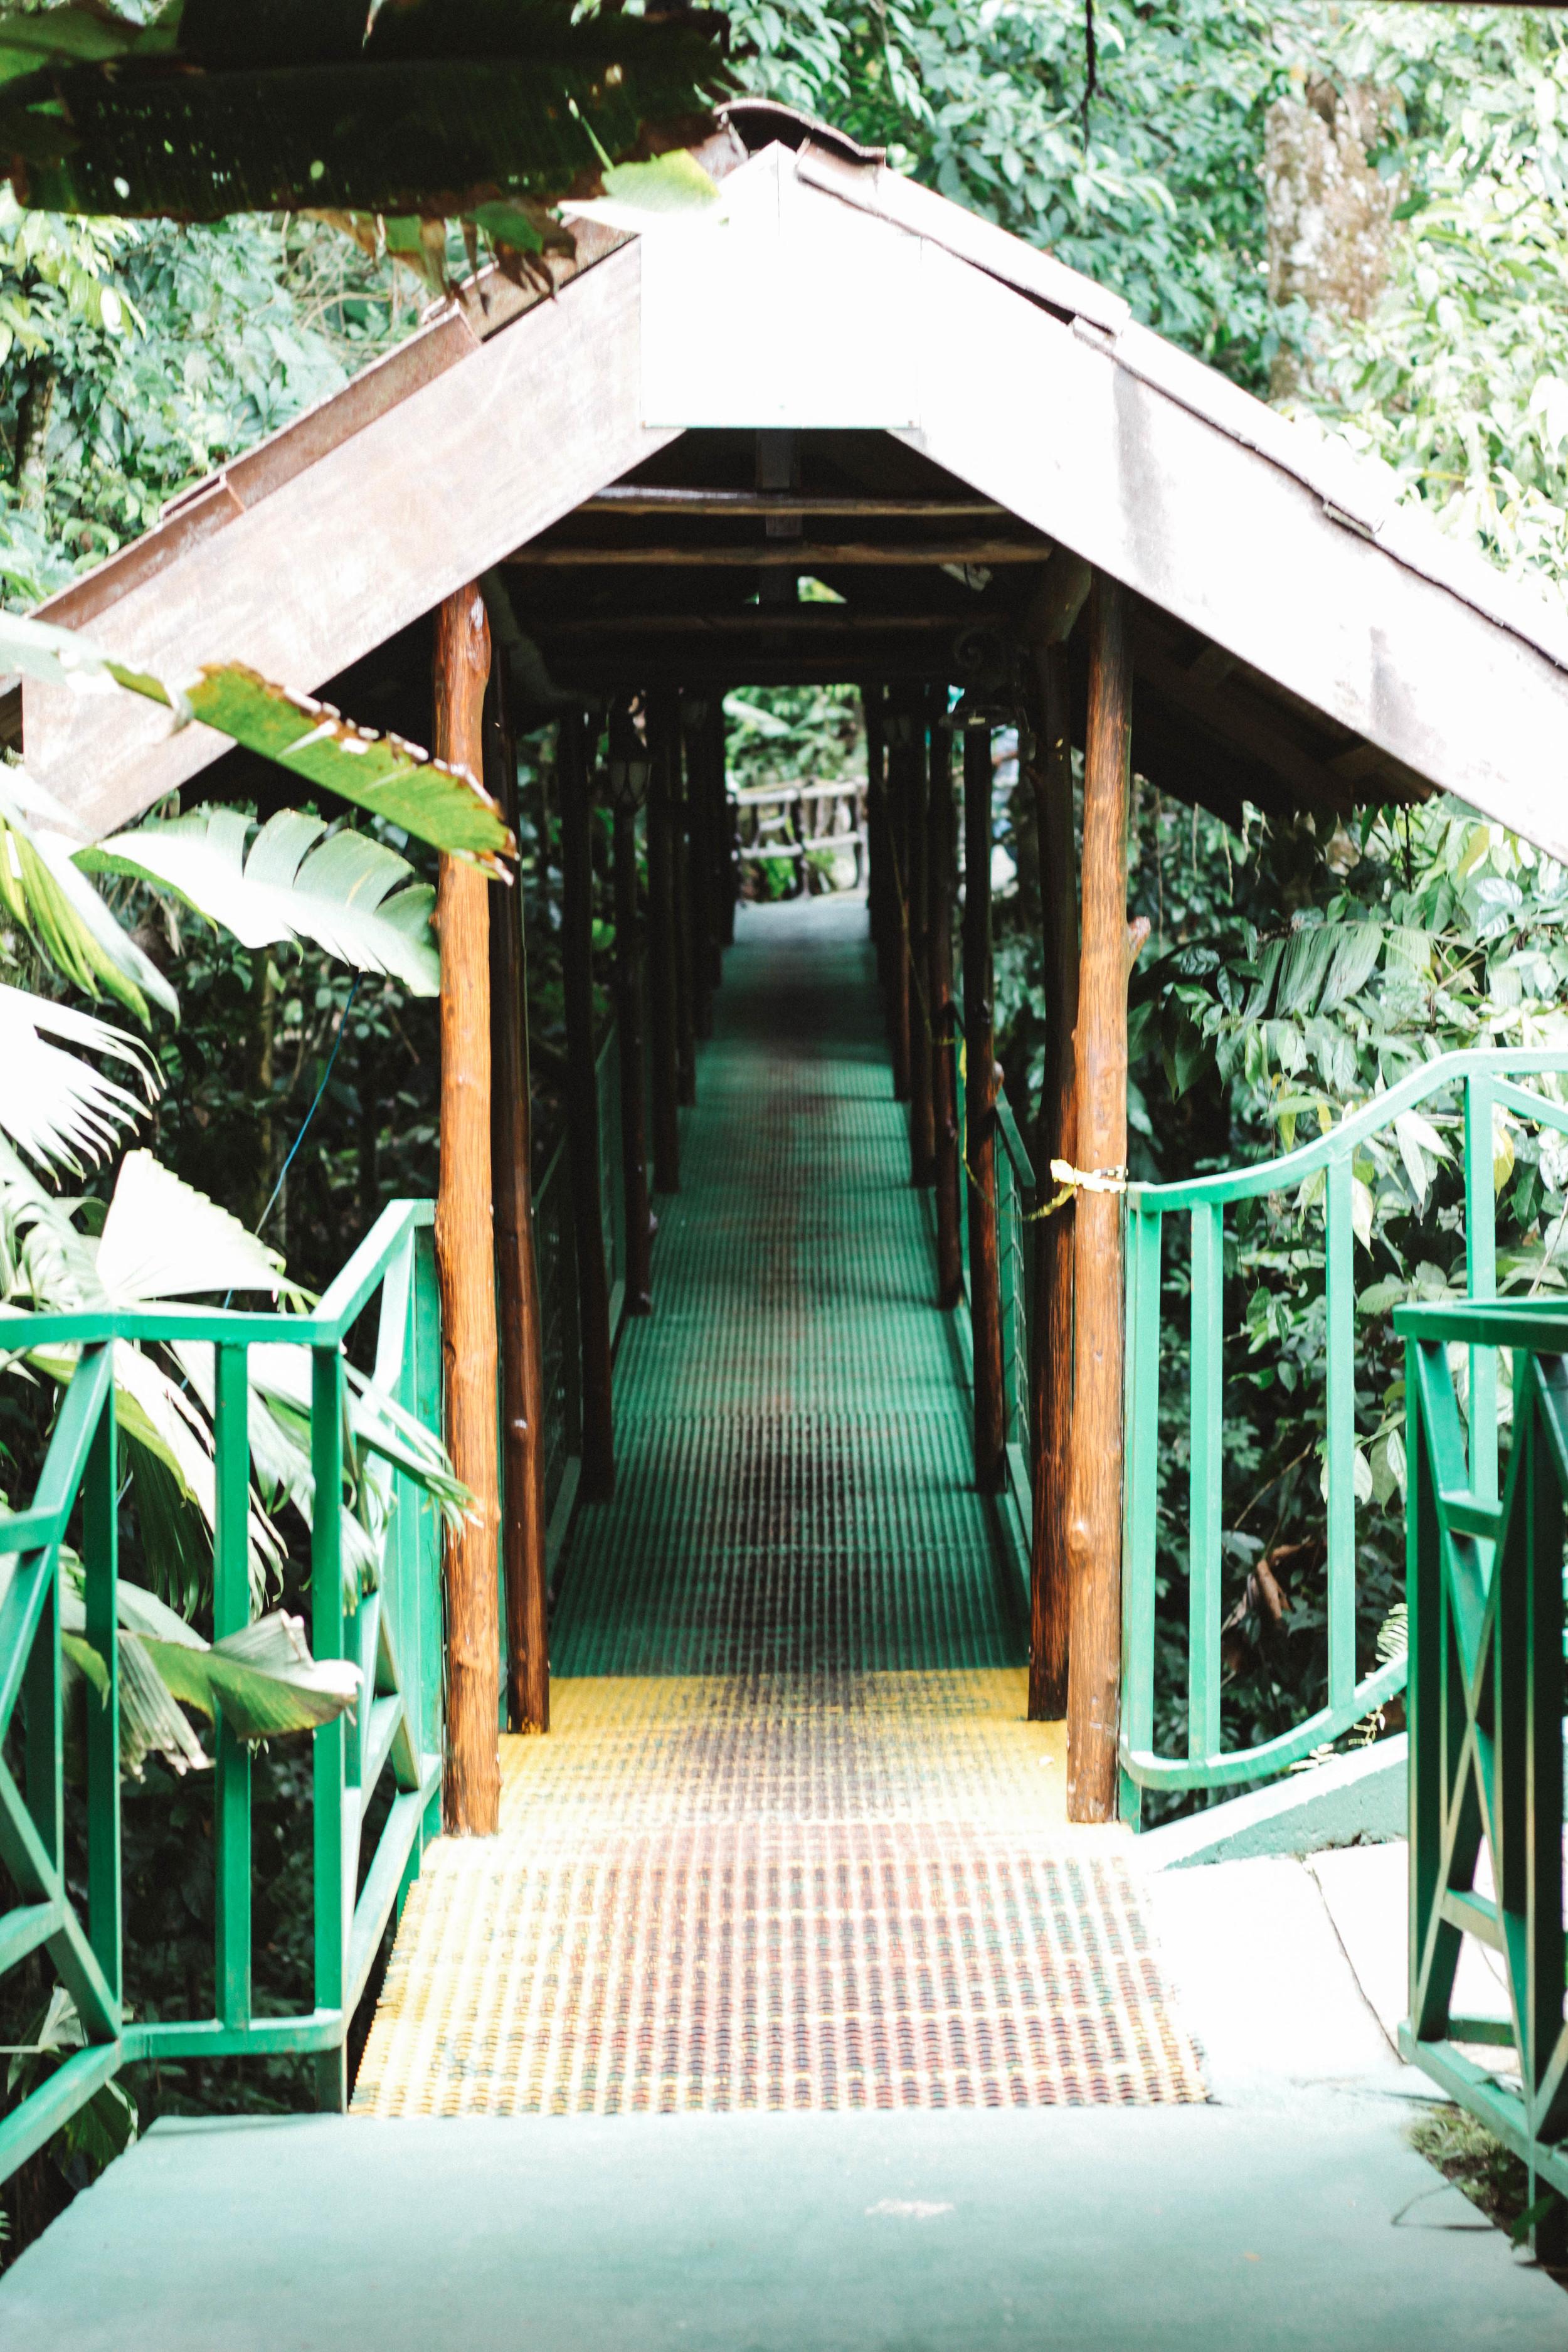 Entrance to La Fortuna Waterfall, Costa Rica